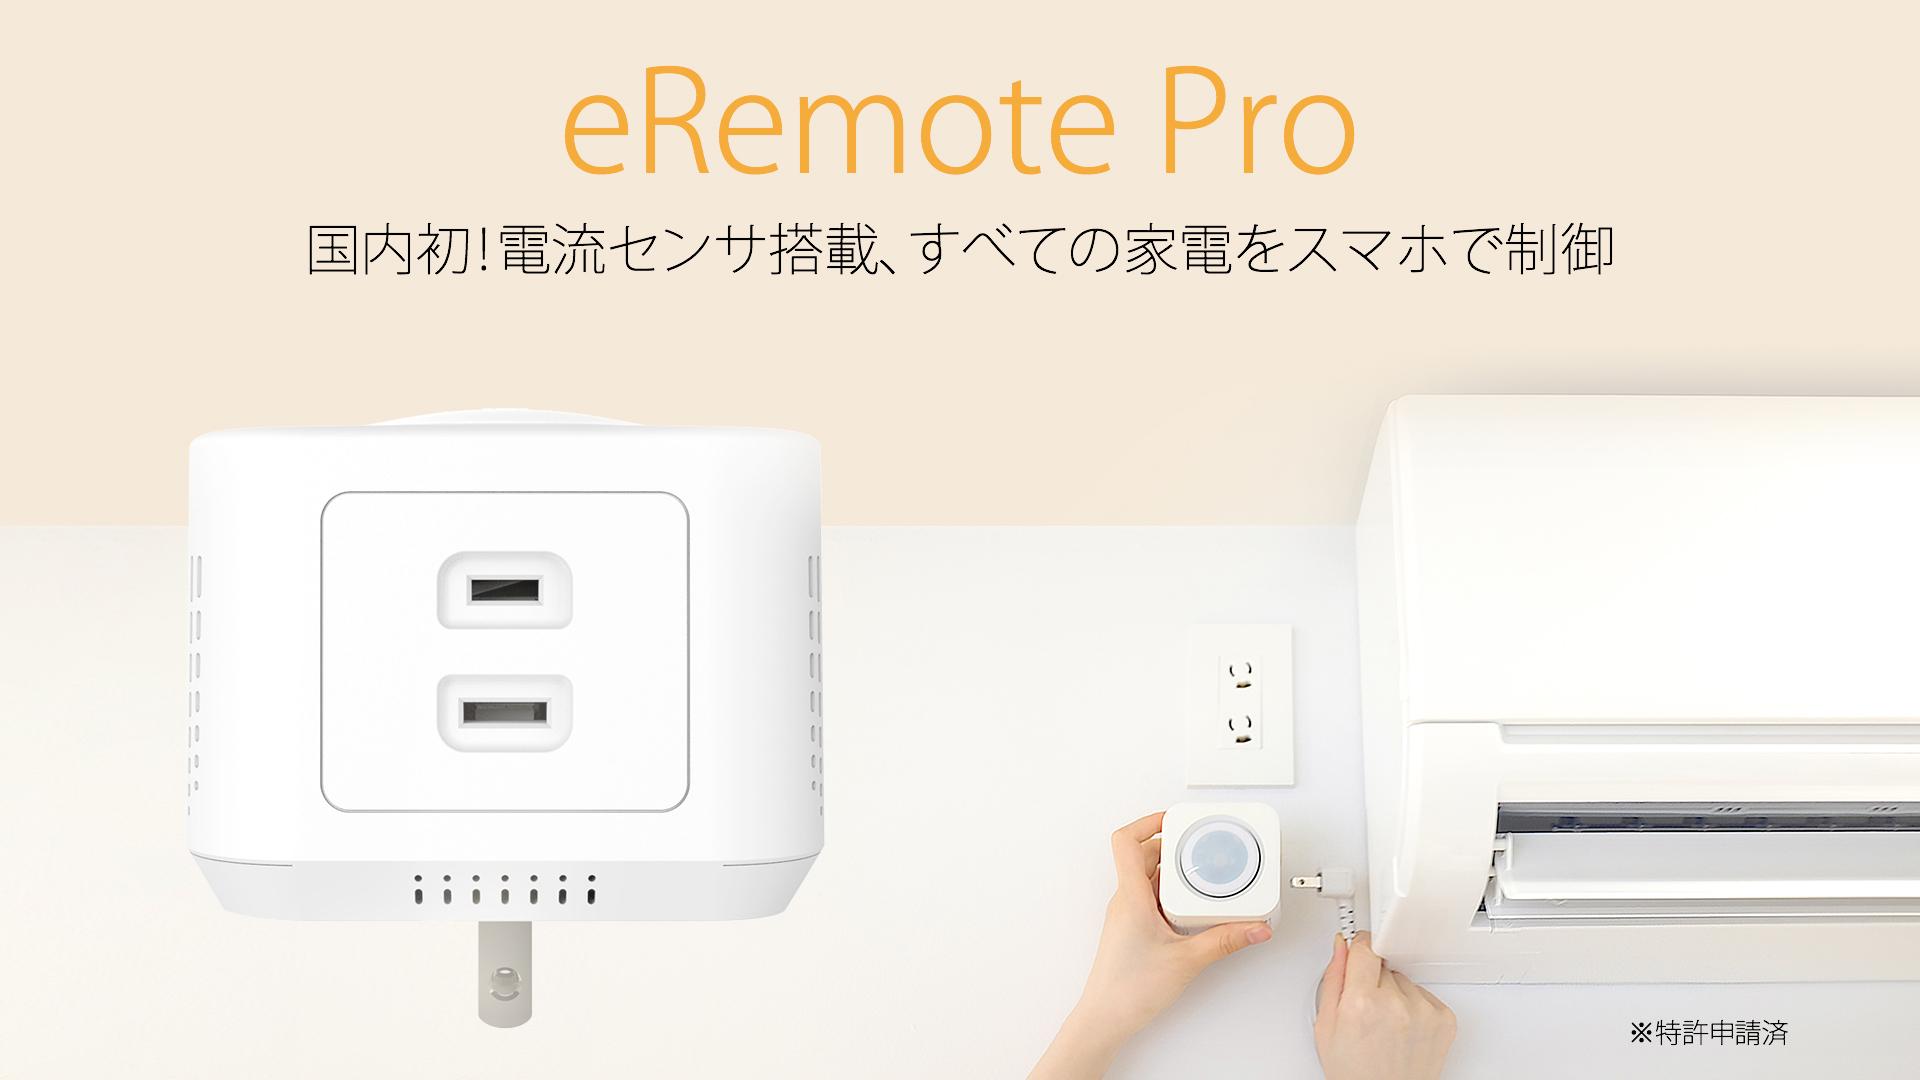 eRemote Pro|IoT 家電 スマートホーム・スマートハウス|Link Japanメイン画像